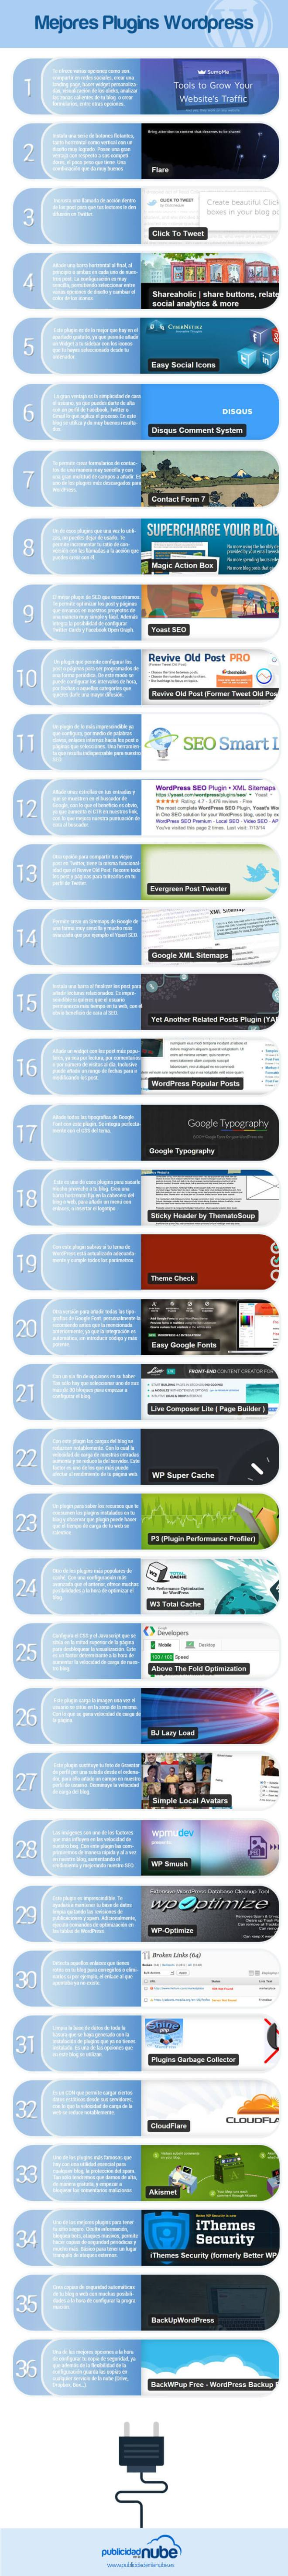 36 mejores plugins gratuitos para WordPress